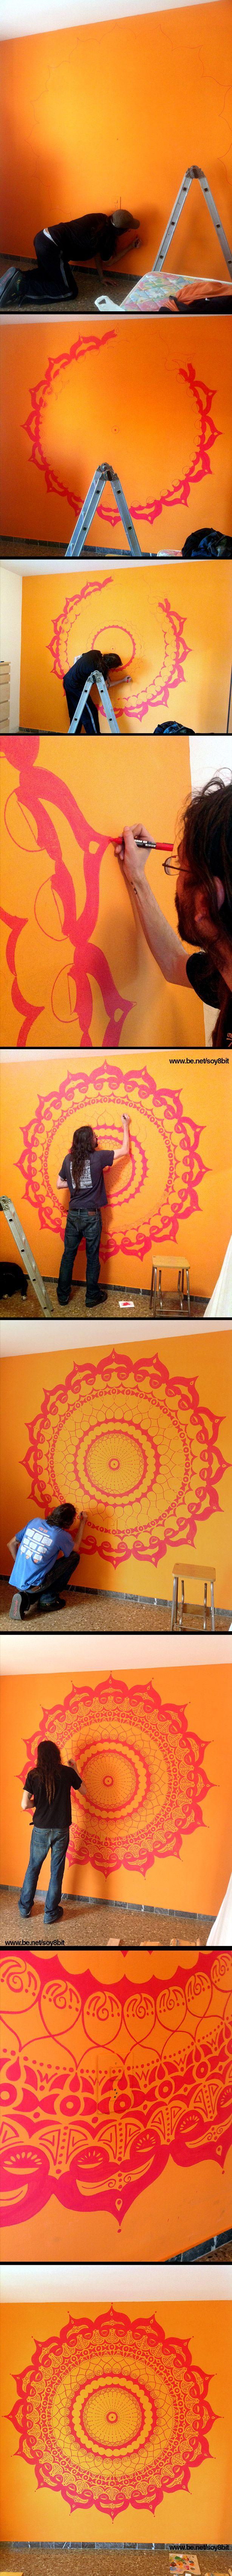 Mandala Wall, pintado por Héctor Sánchez...